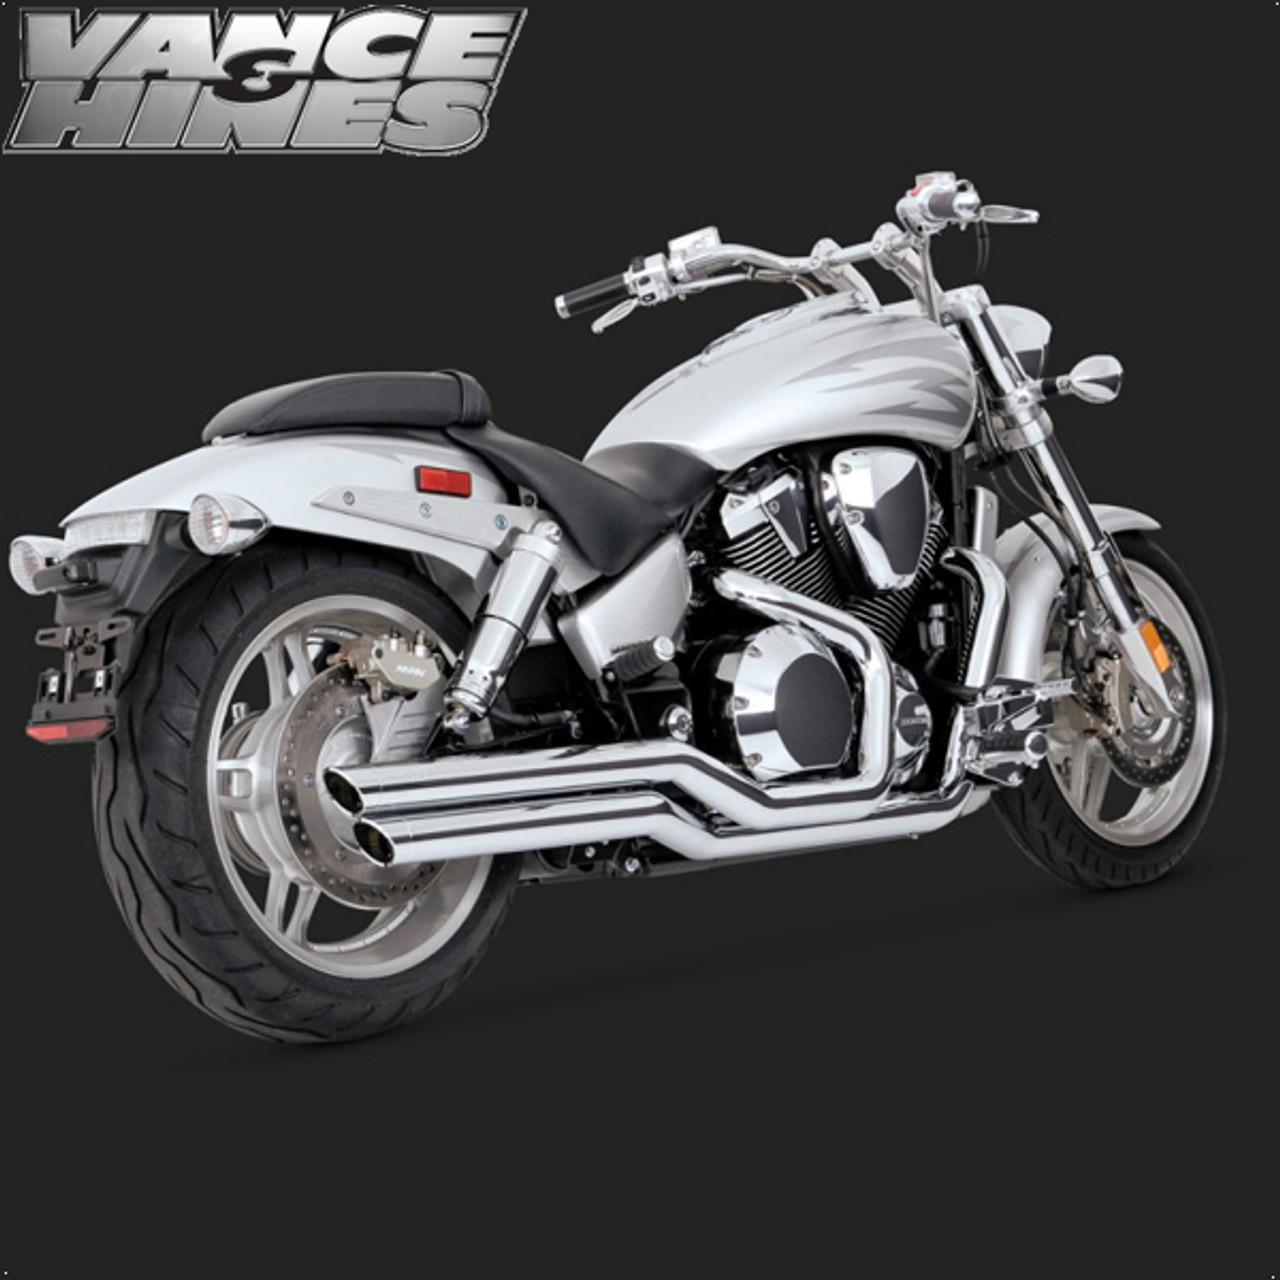 vance hines big shot full exhaust system honda vtx1800c 02 08